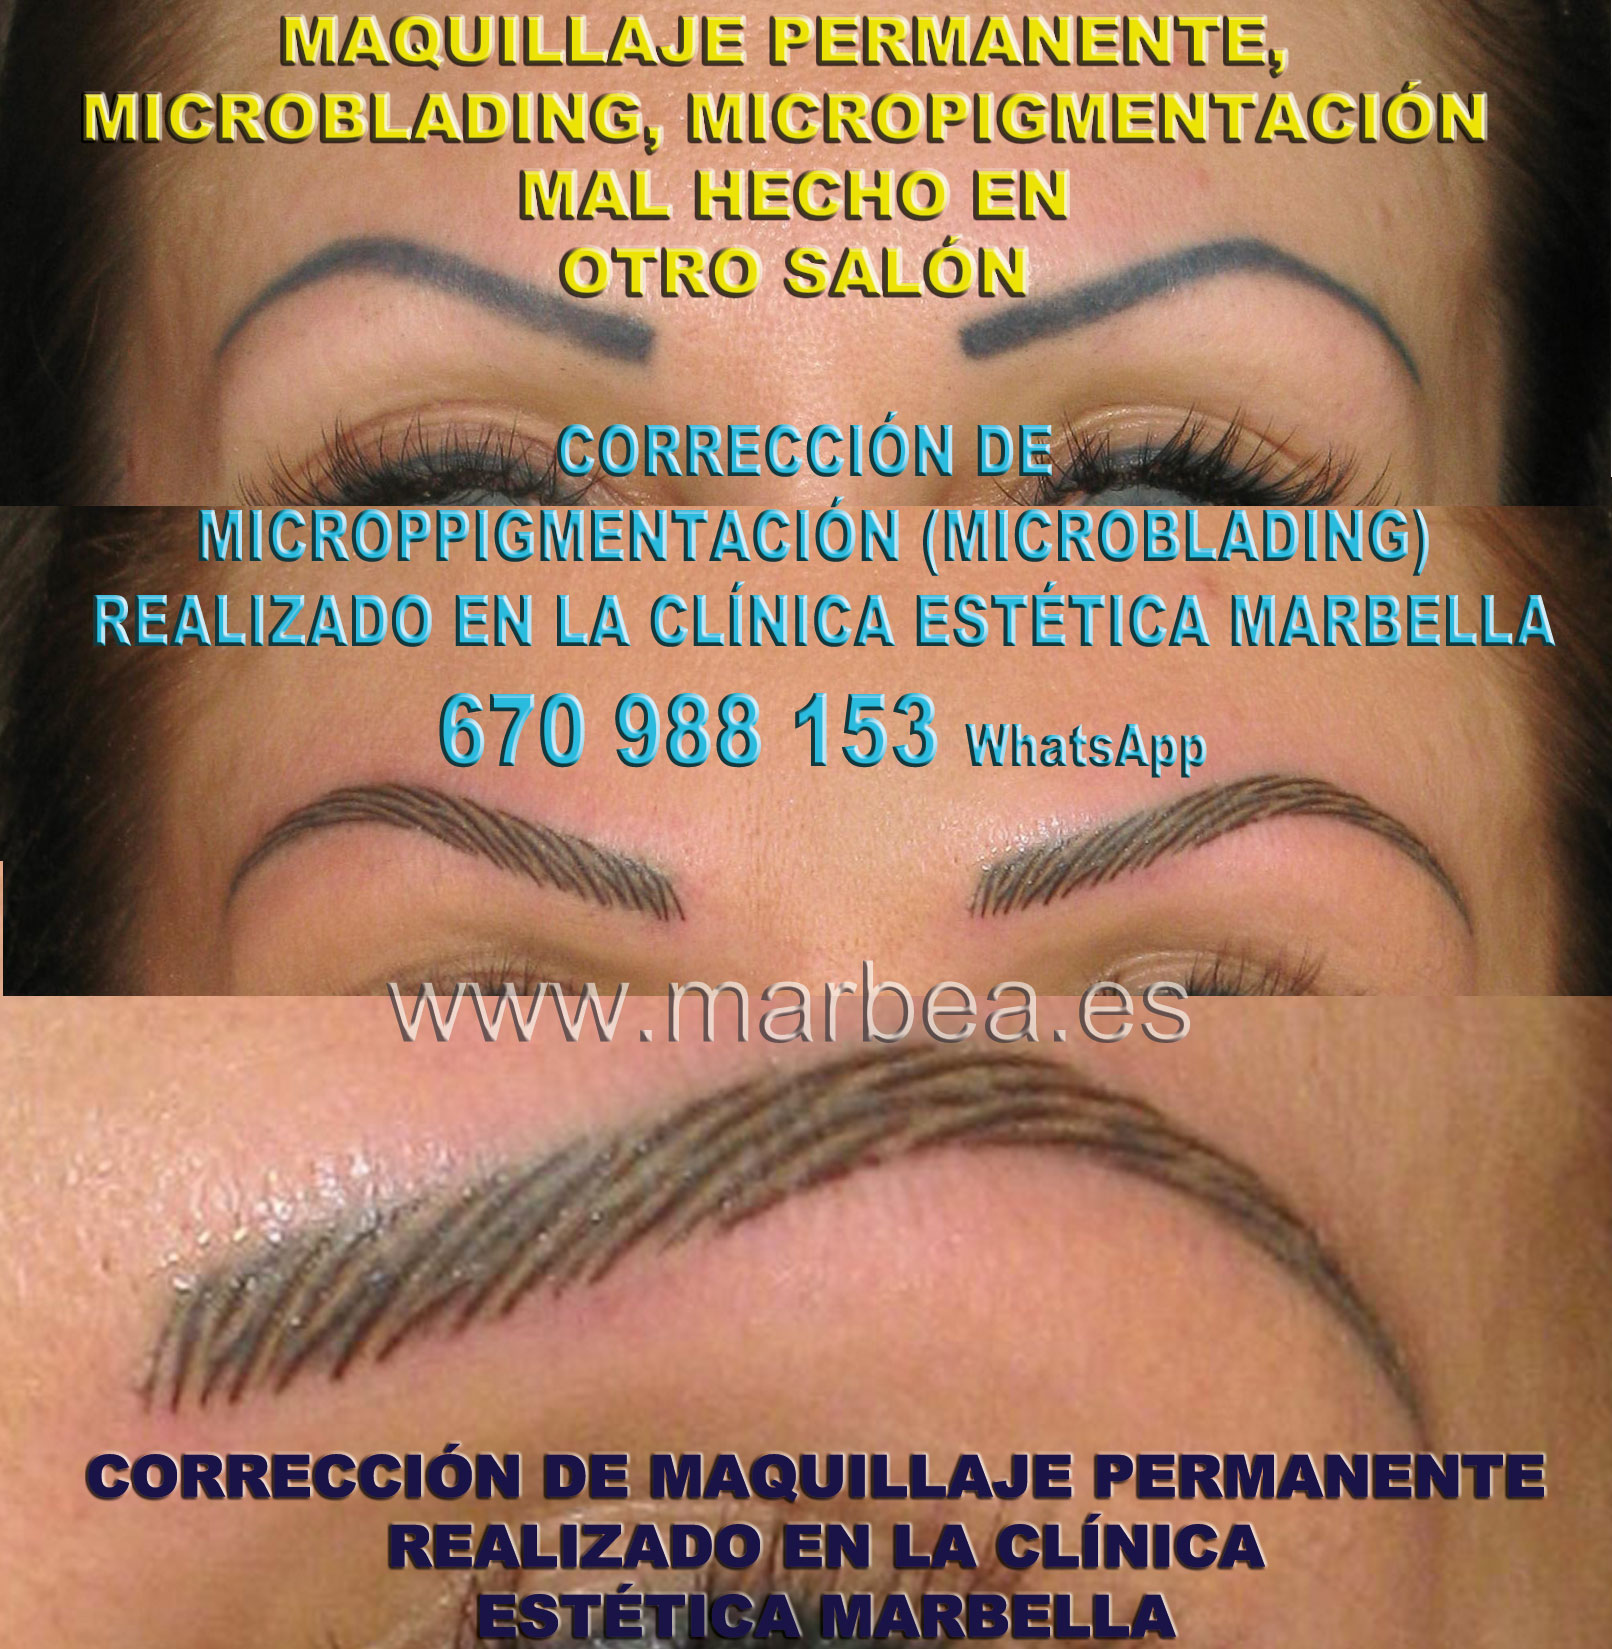 ELIMINAR TATUAJE CEJAS clínica estética maquillaje permanete entrega corrección de cejas mal tatuadas,corregir micropigmentación no deseada